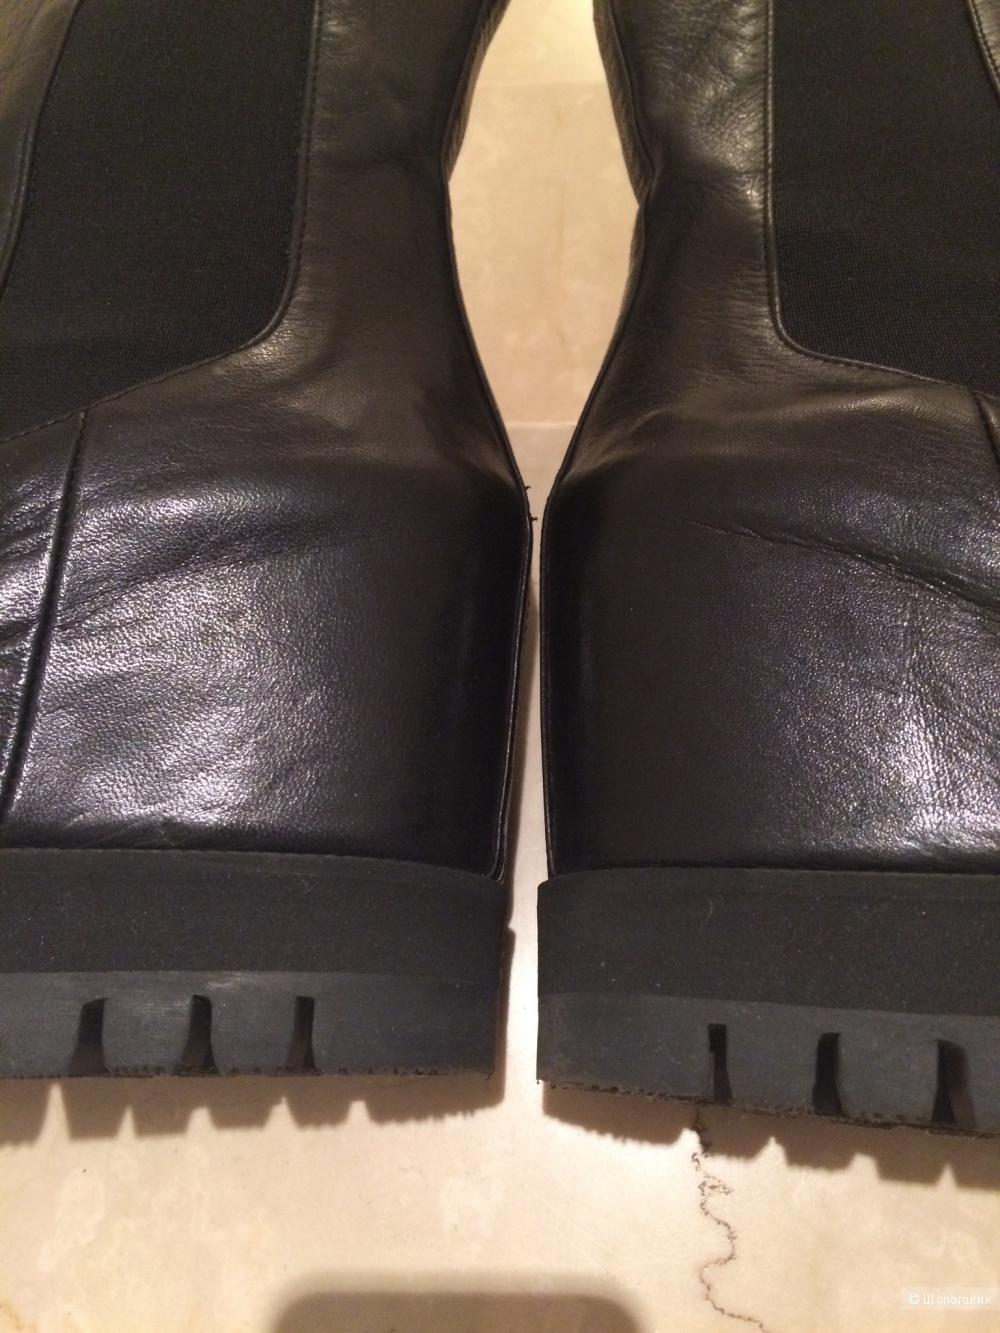 Полусапожки-ботинки Equitare 38